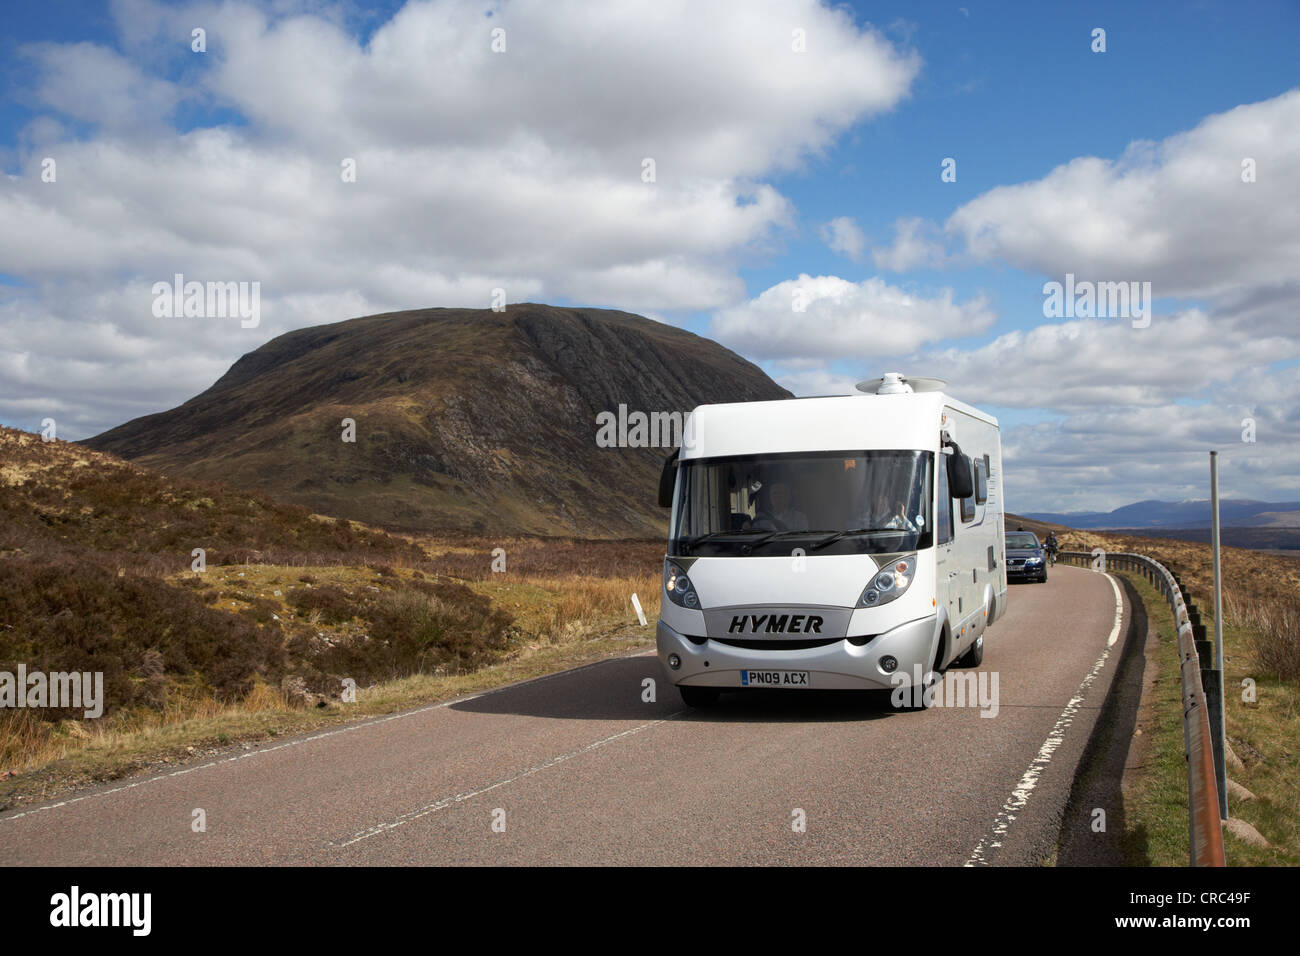 motorhome on the a82 road in glencoe highlands scotland uk - Stock Image